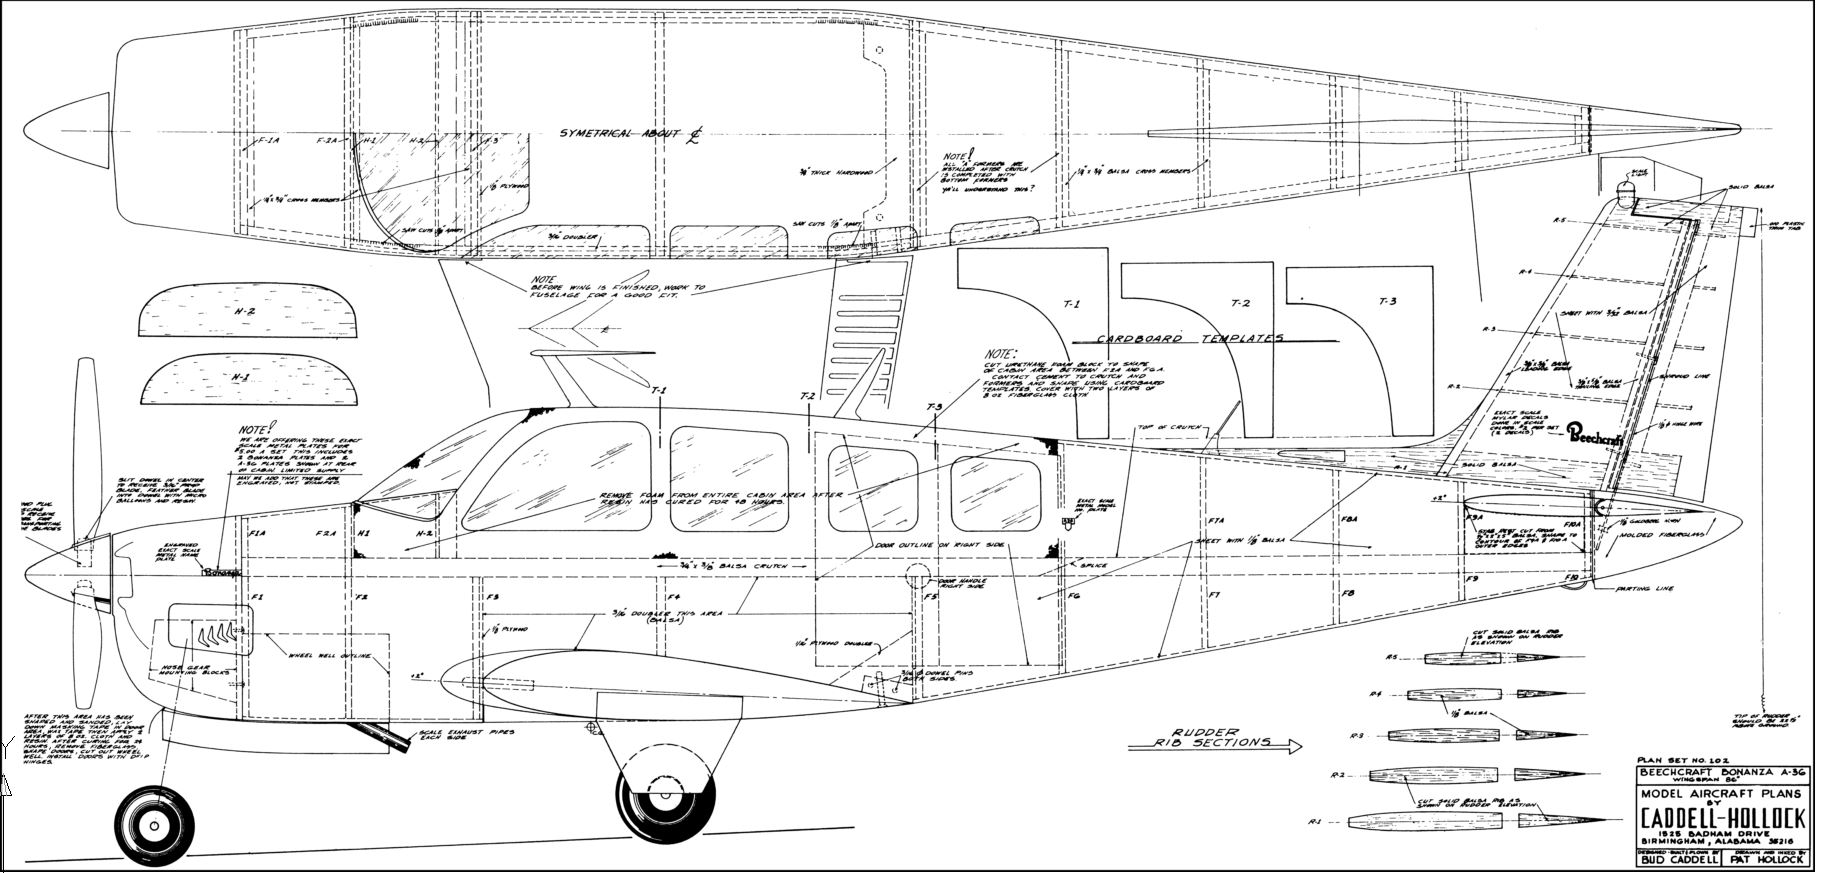 Click image for larger version  Name:Bonanza A-36 plan.JPG Views:472 Size:256.9 KB ID:2204784